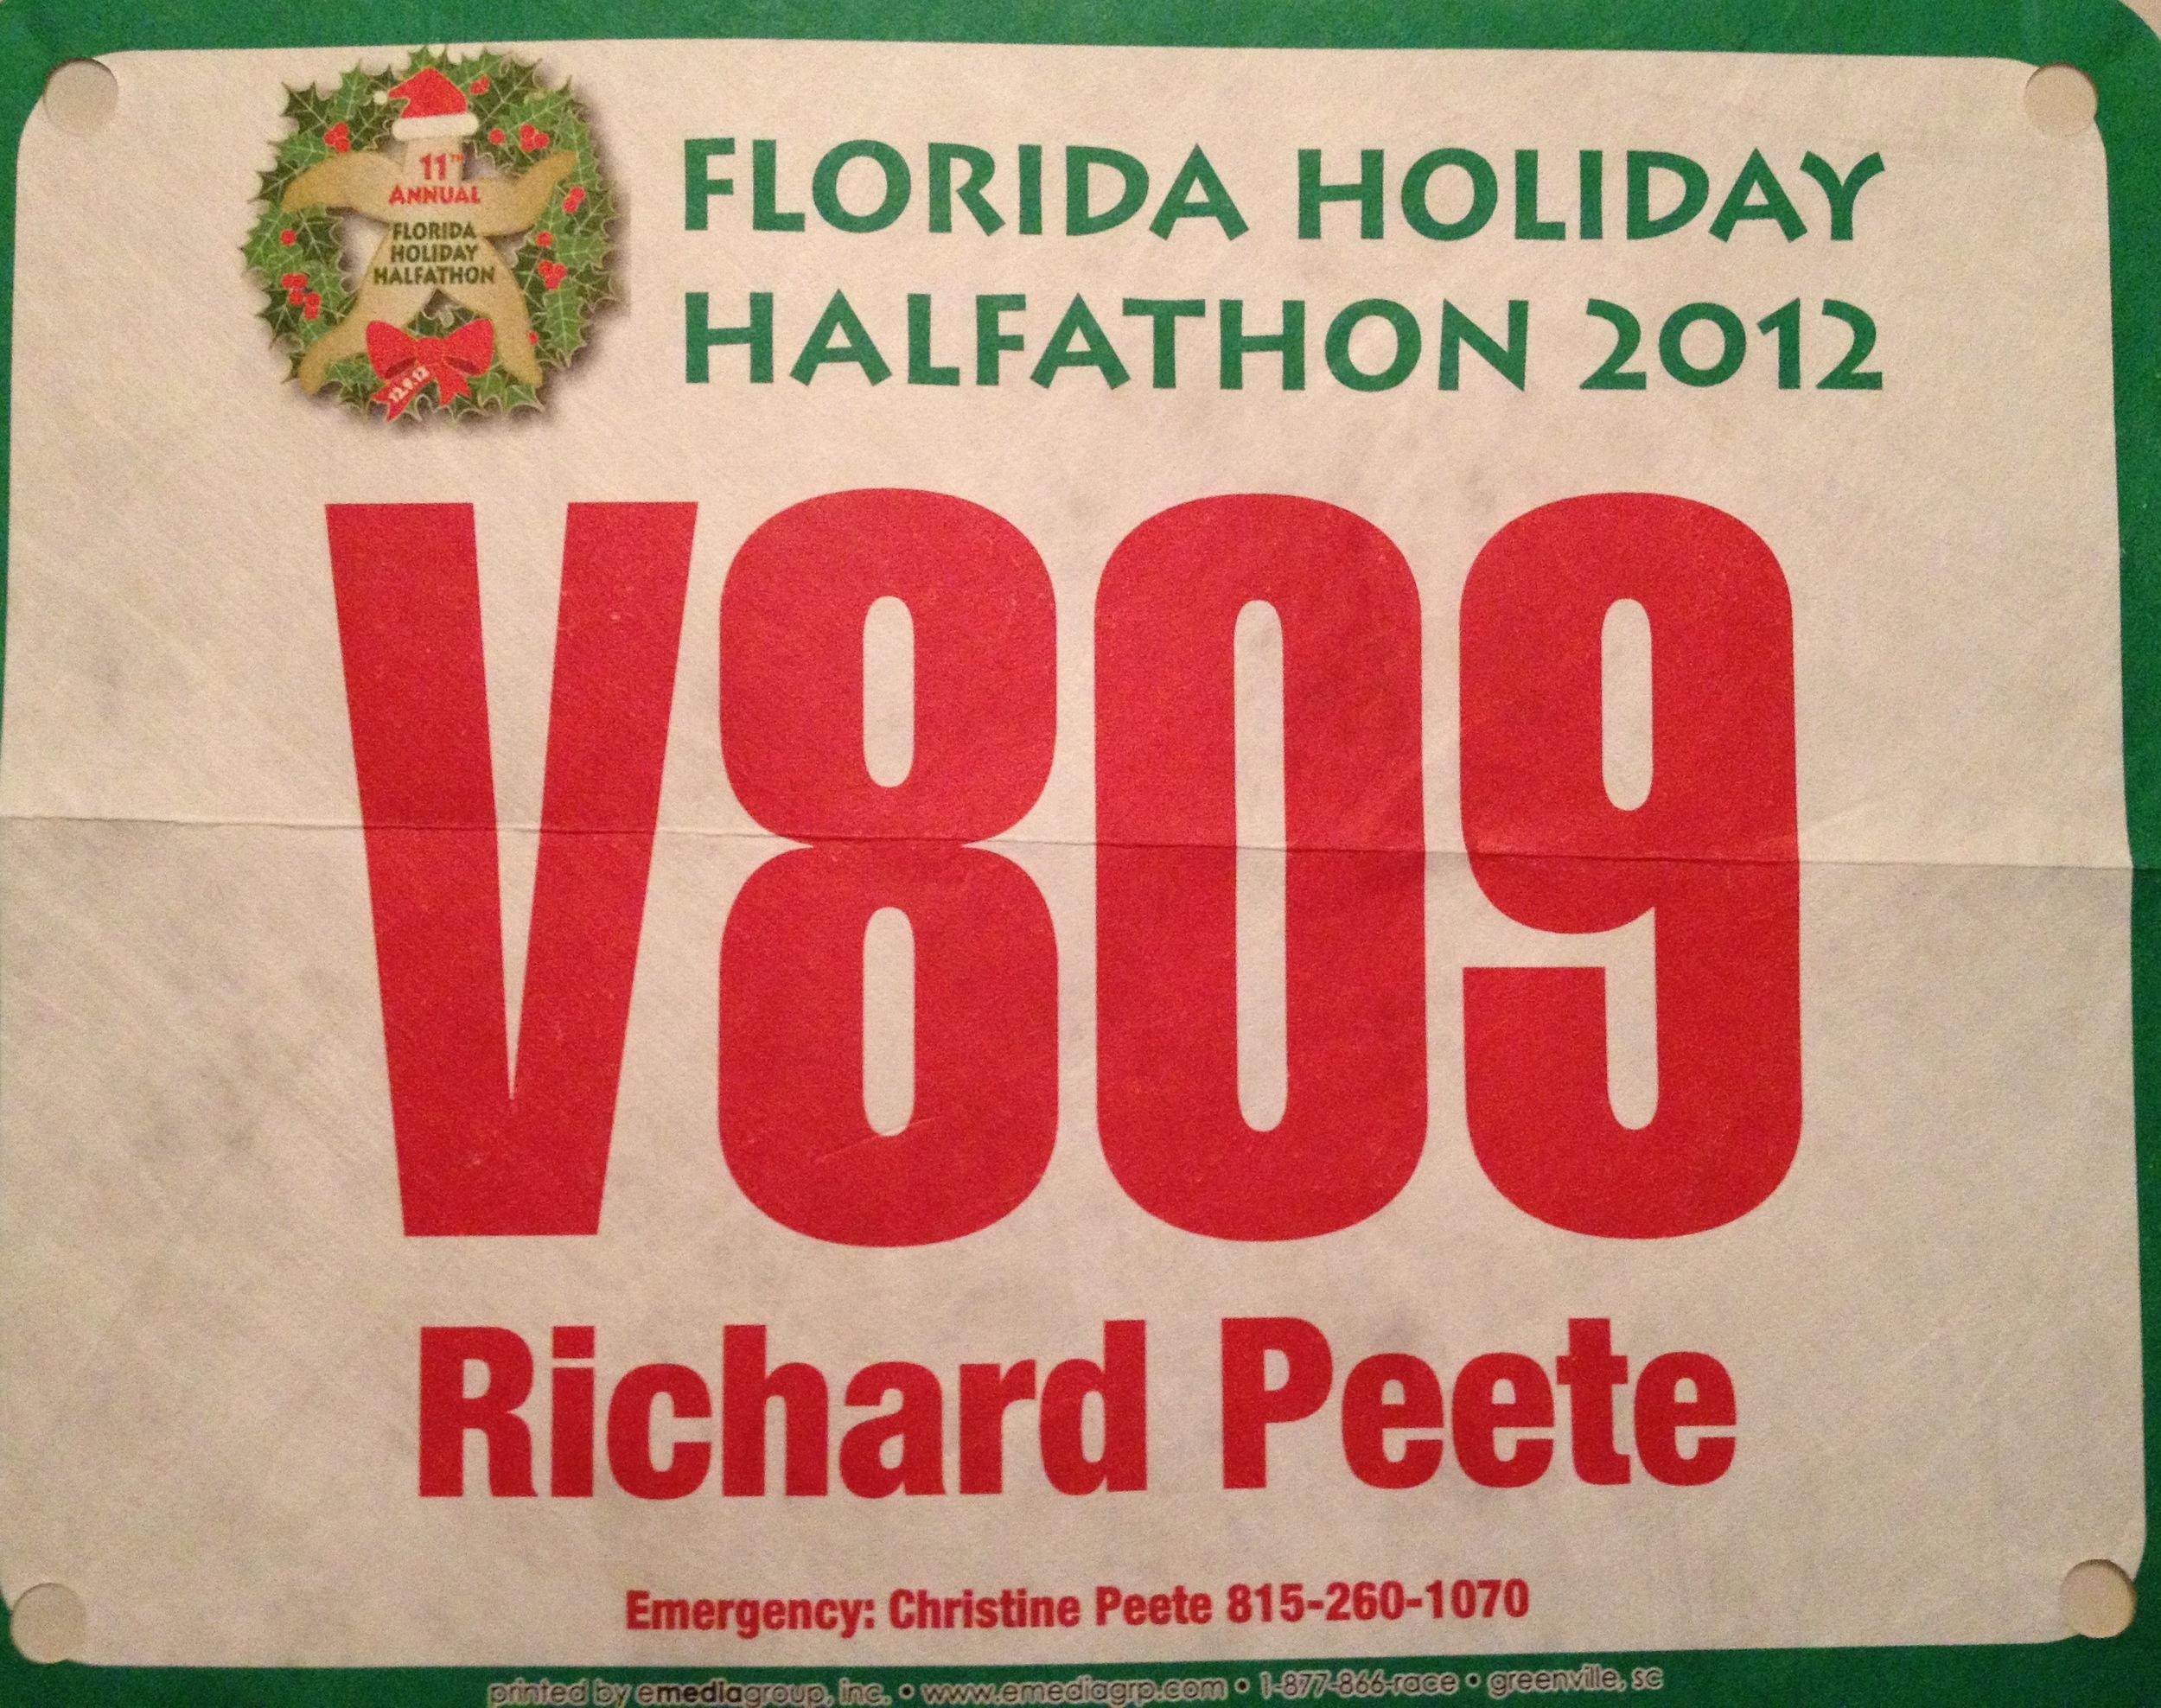 My personalized Bib for the Florida Halfathon